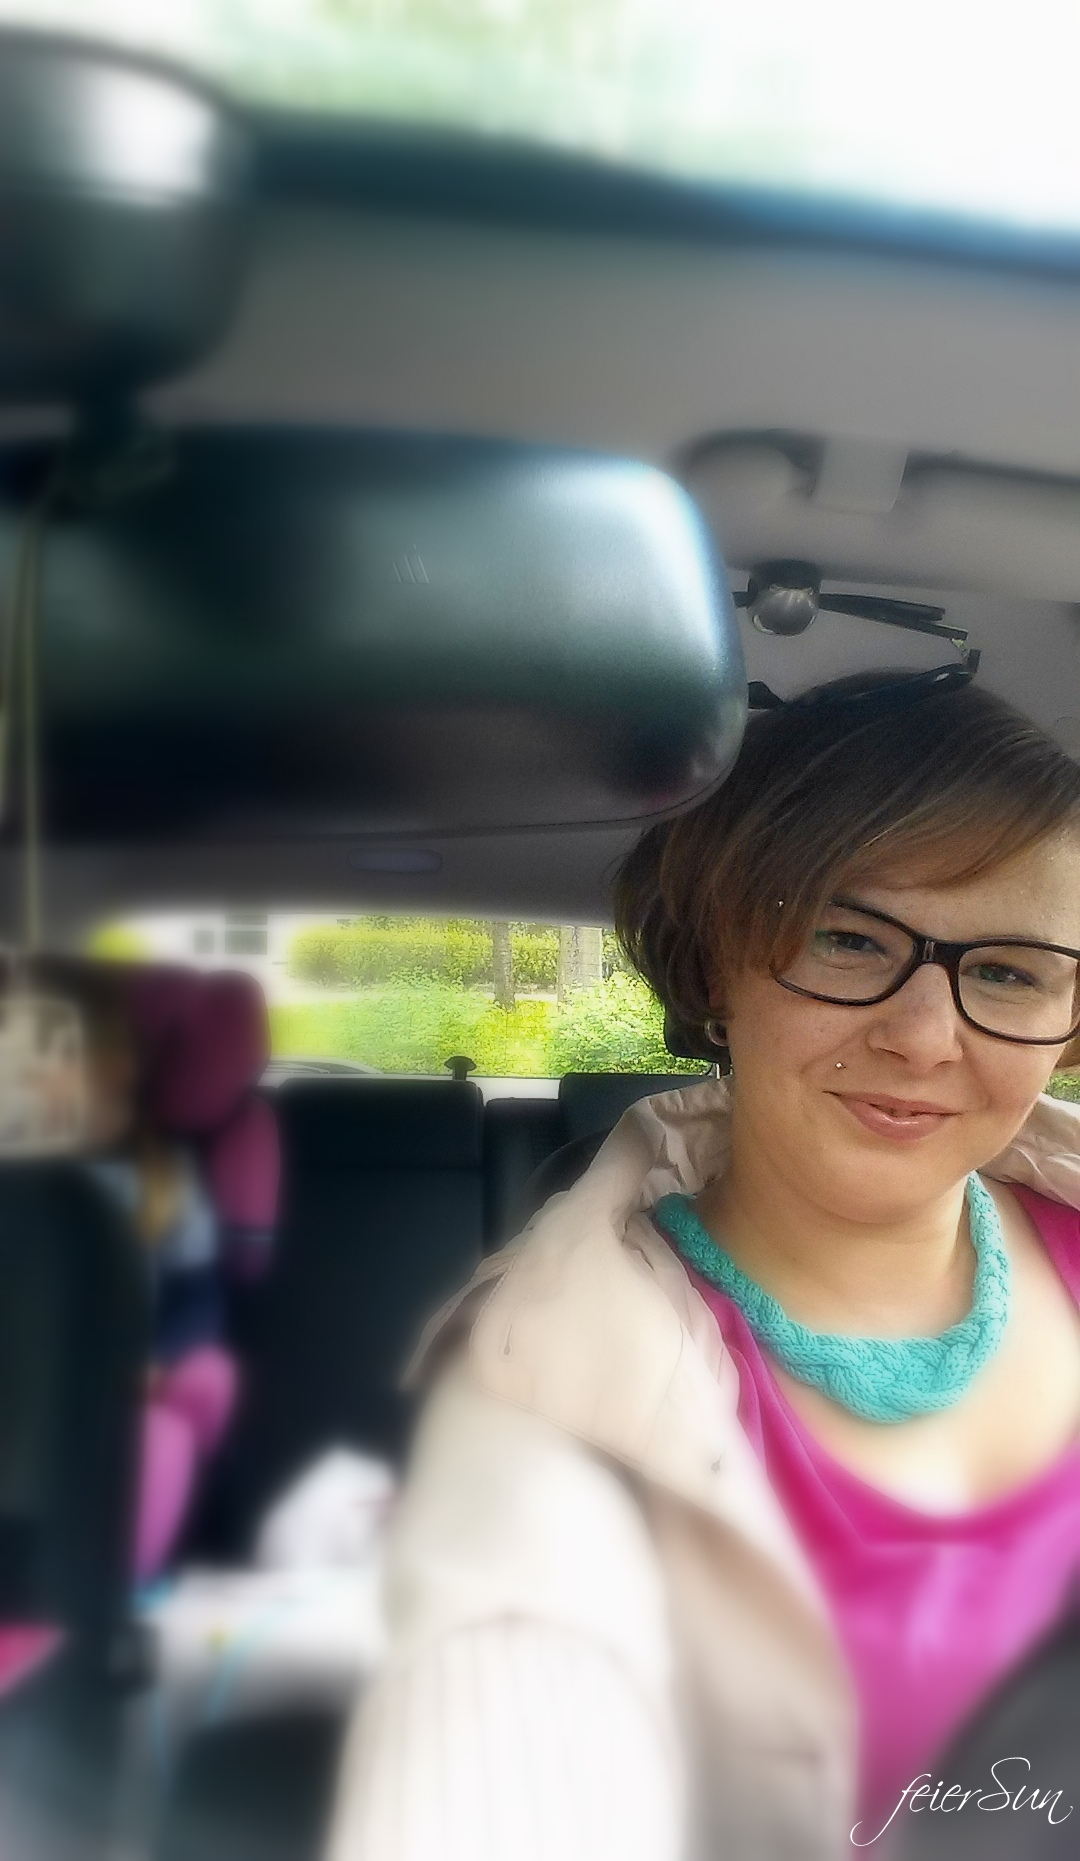 Abenteuer Berlin - Events überall - BlogFamilia - Berlin mit dem Auto